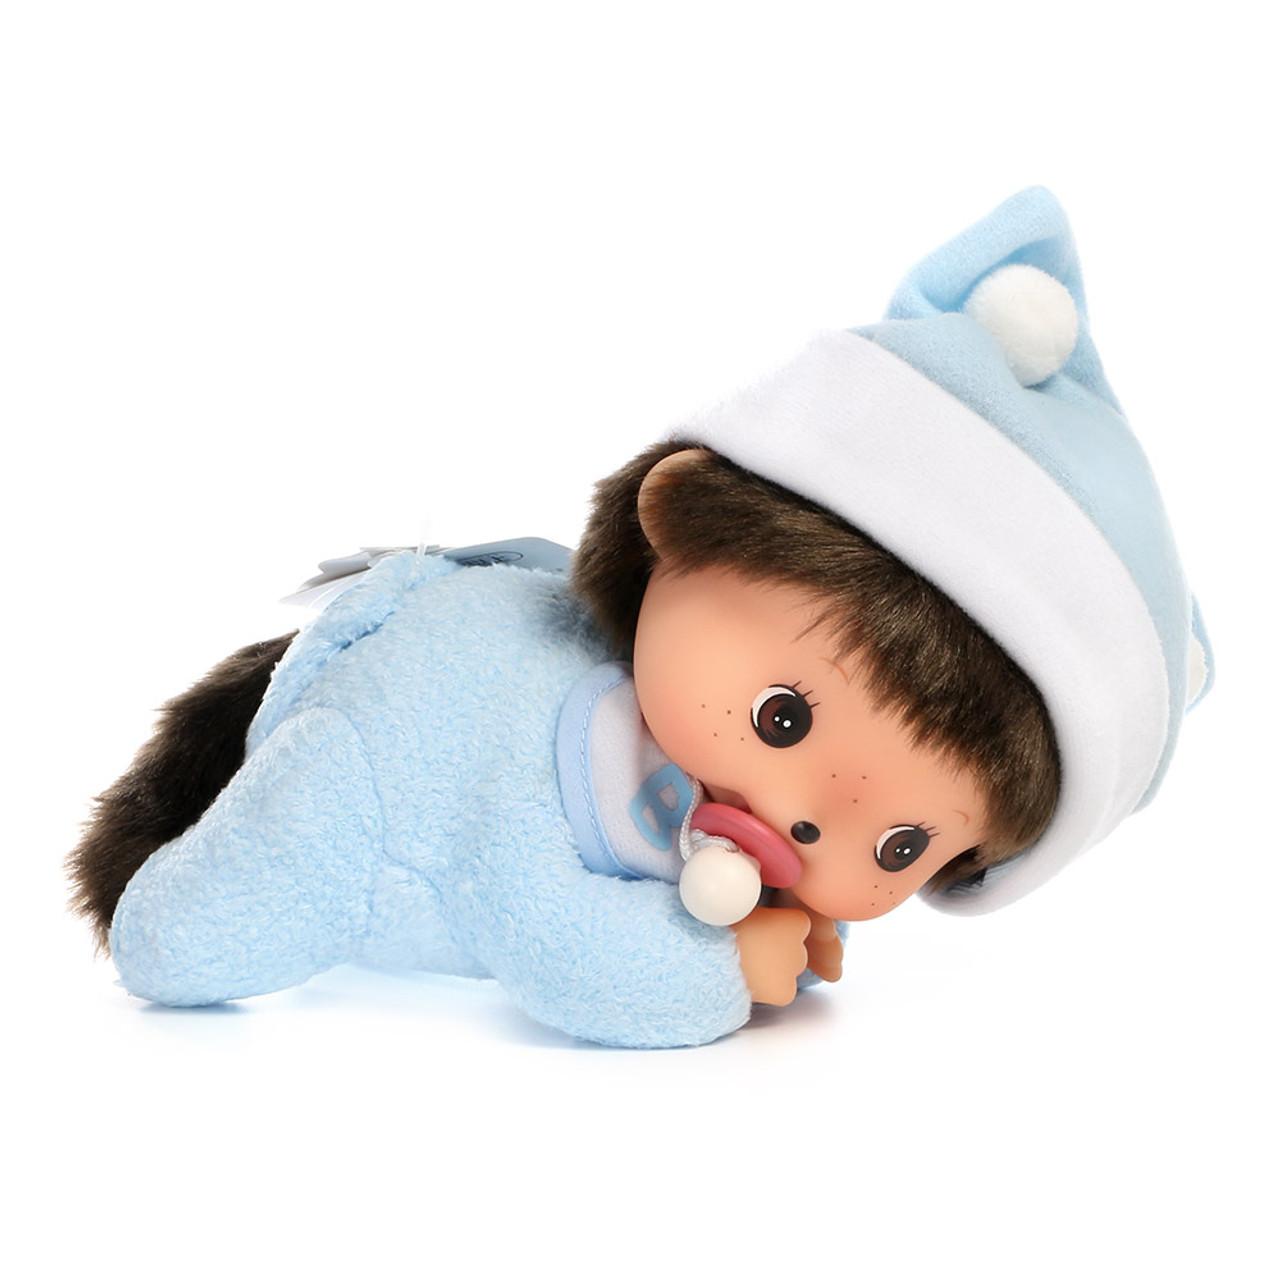 Sekiguchi Bebichhichi Monkey Boy Baby Blue Shirt Crawling Plush Doll - Medium ( Front View )